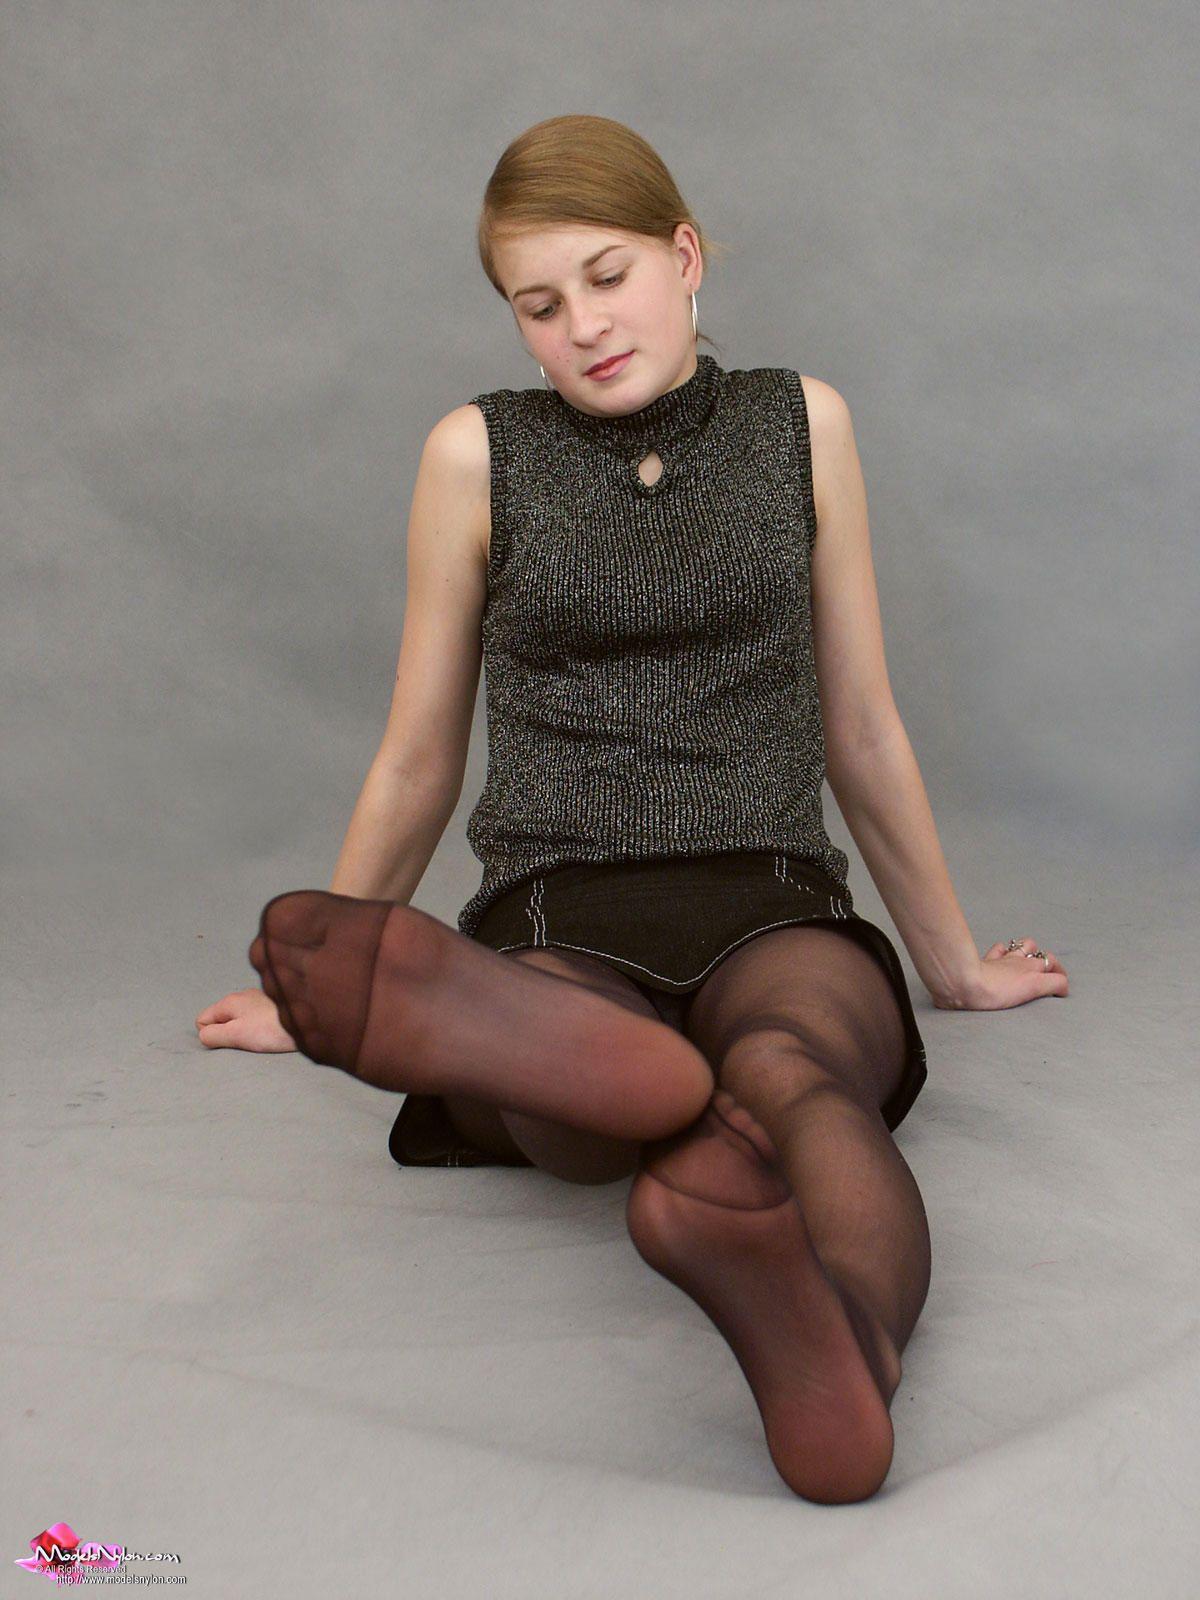 Jodie foster pantyhose photos 743